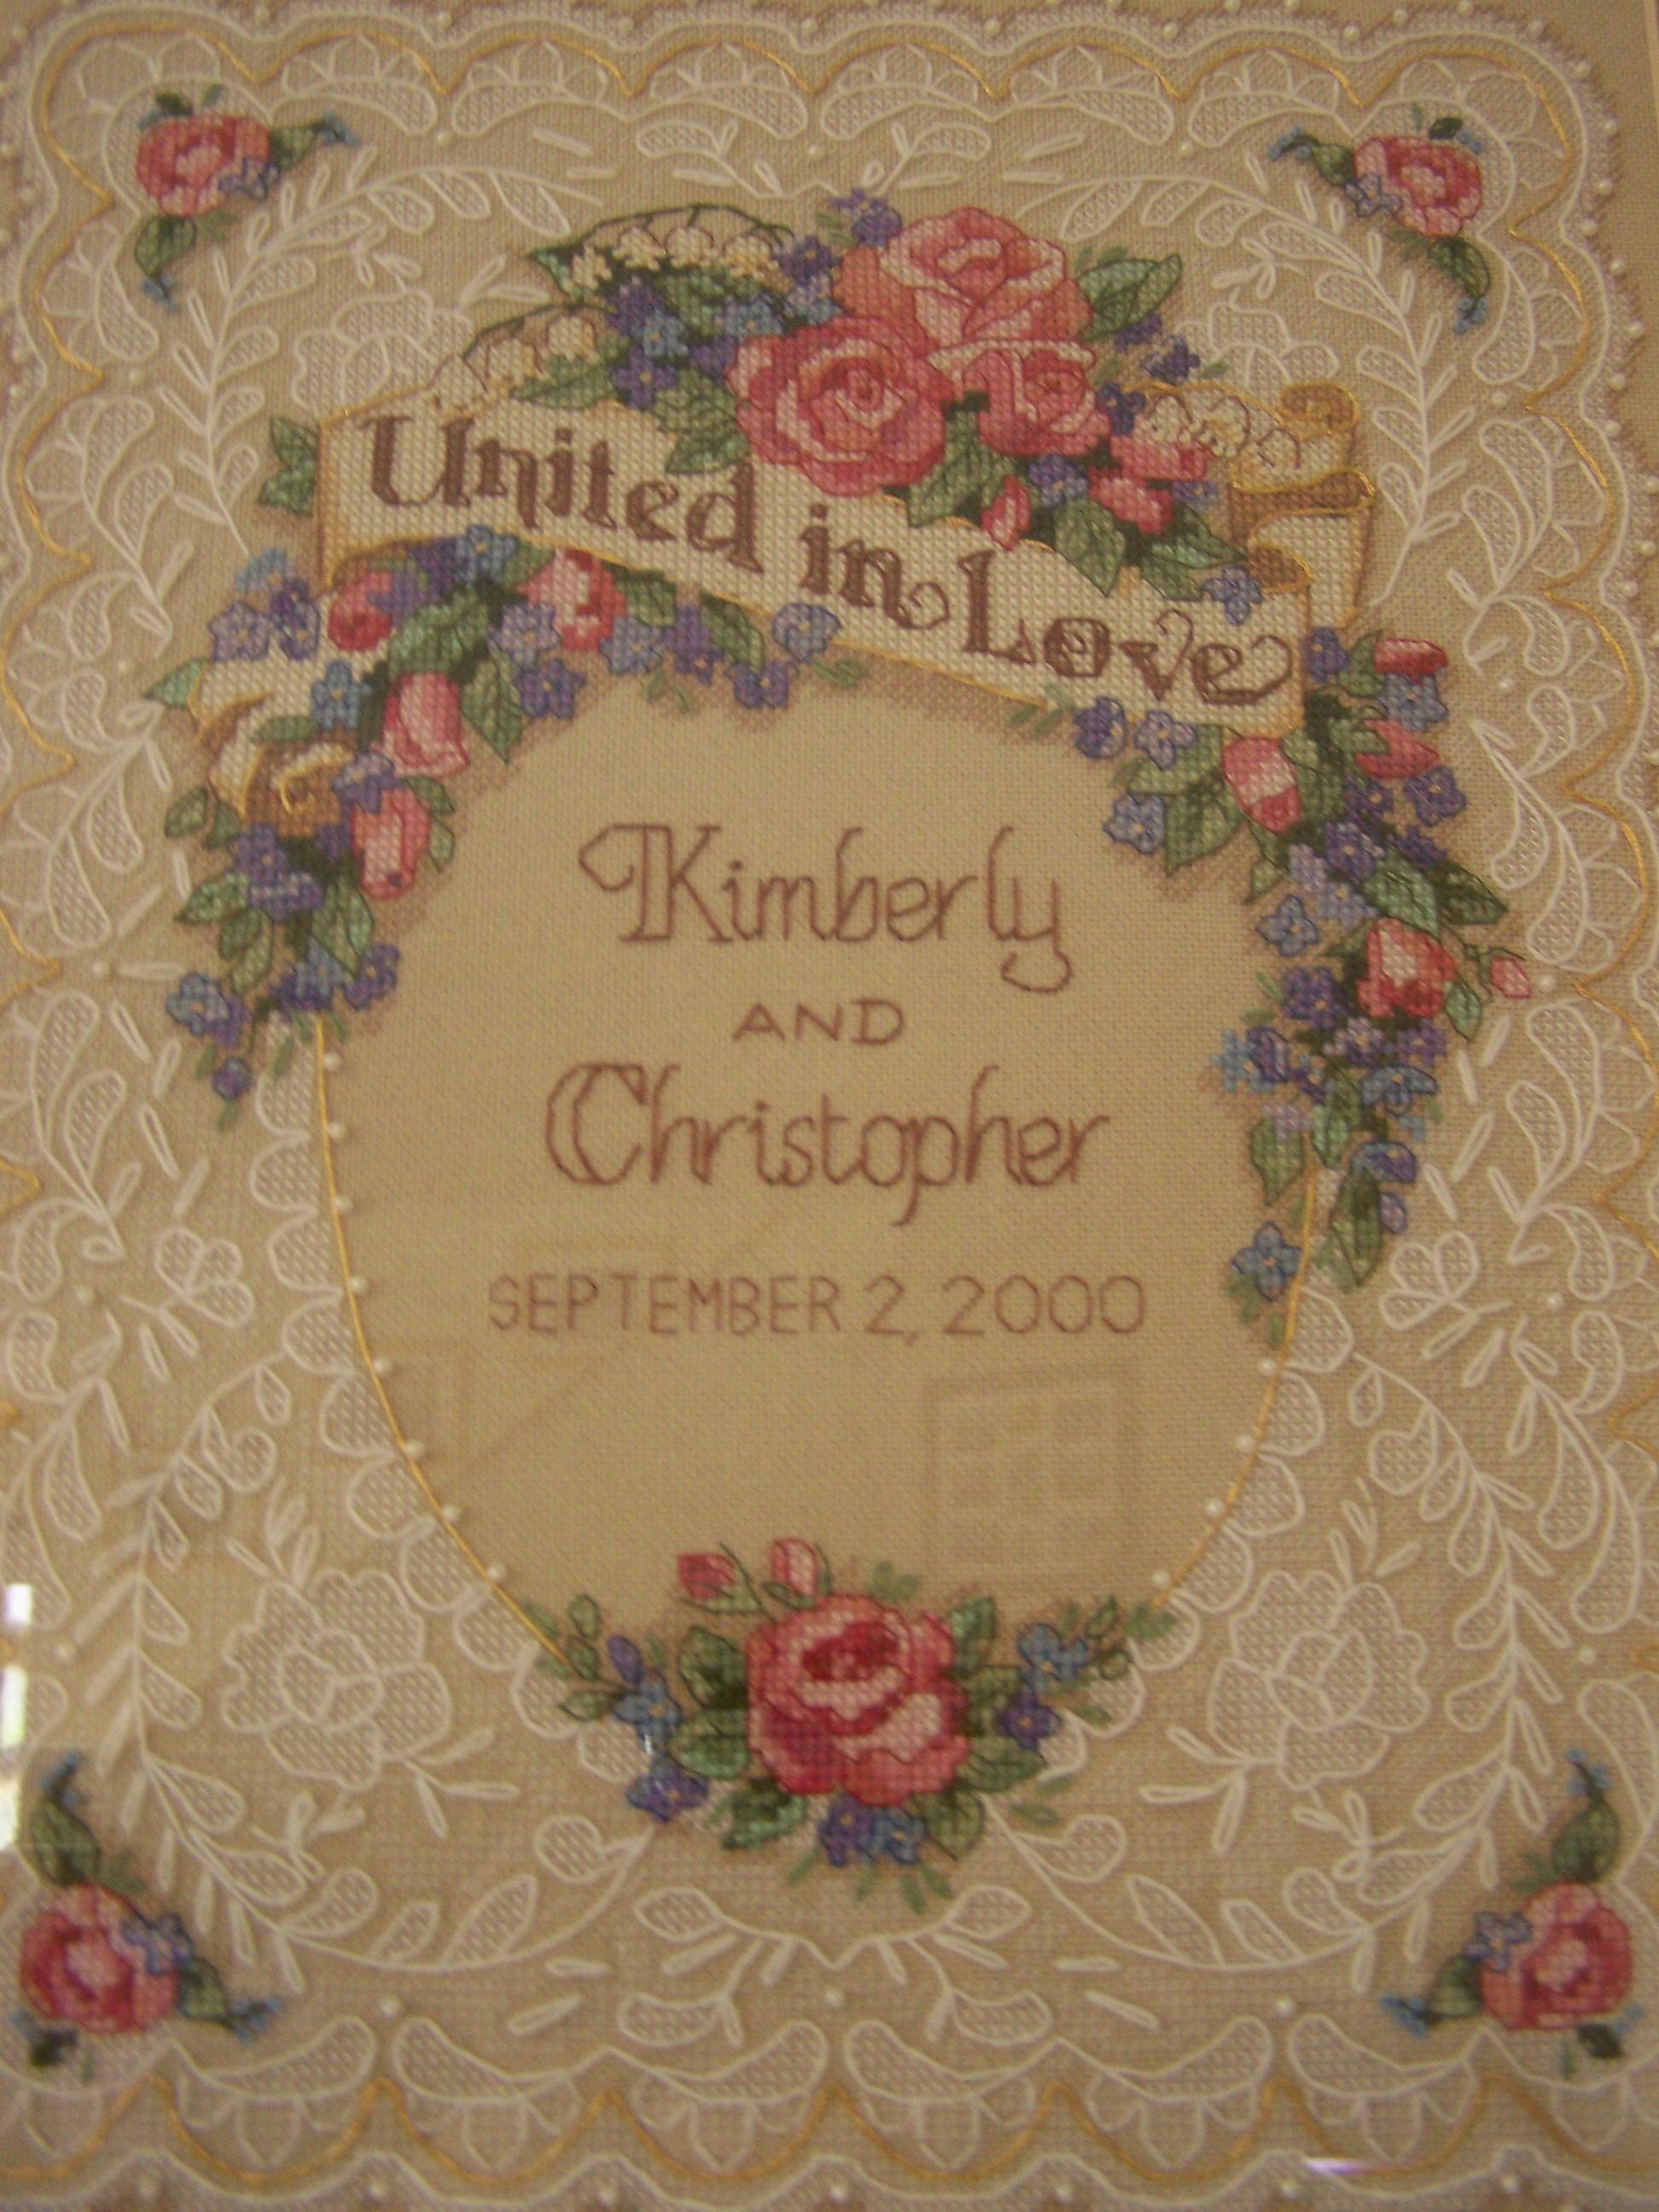 Wedding Gift Ideas Uk: Homemade Wedding Gift Ideas